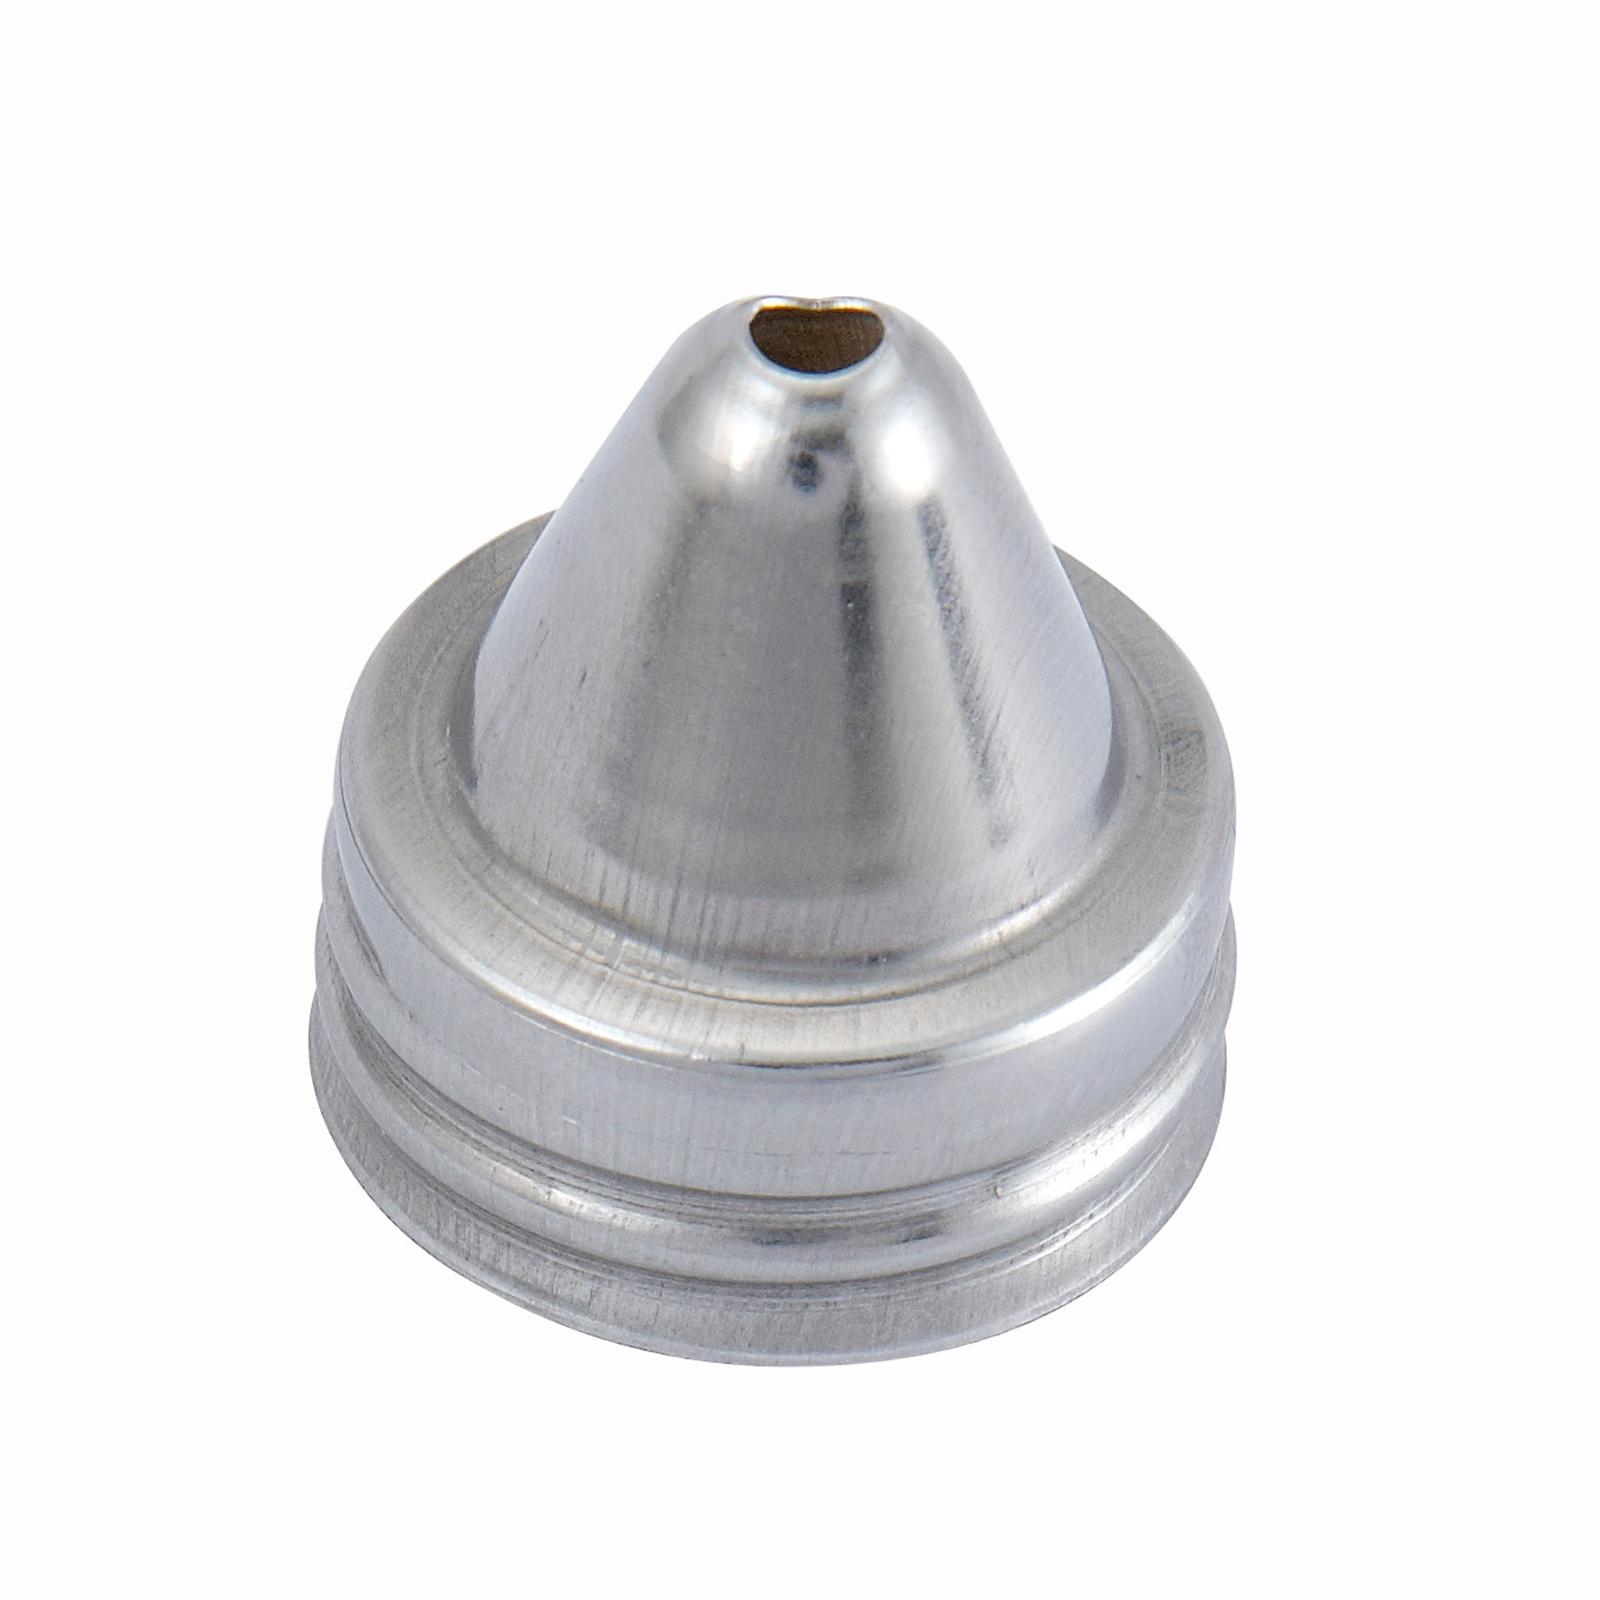 3103-35 Winco G-104C oil & vinegar cruet, top